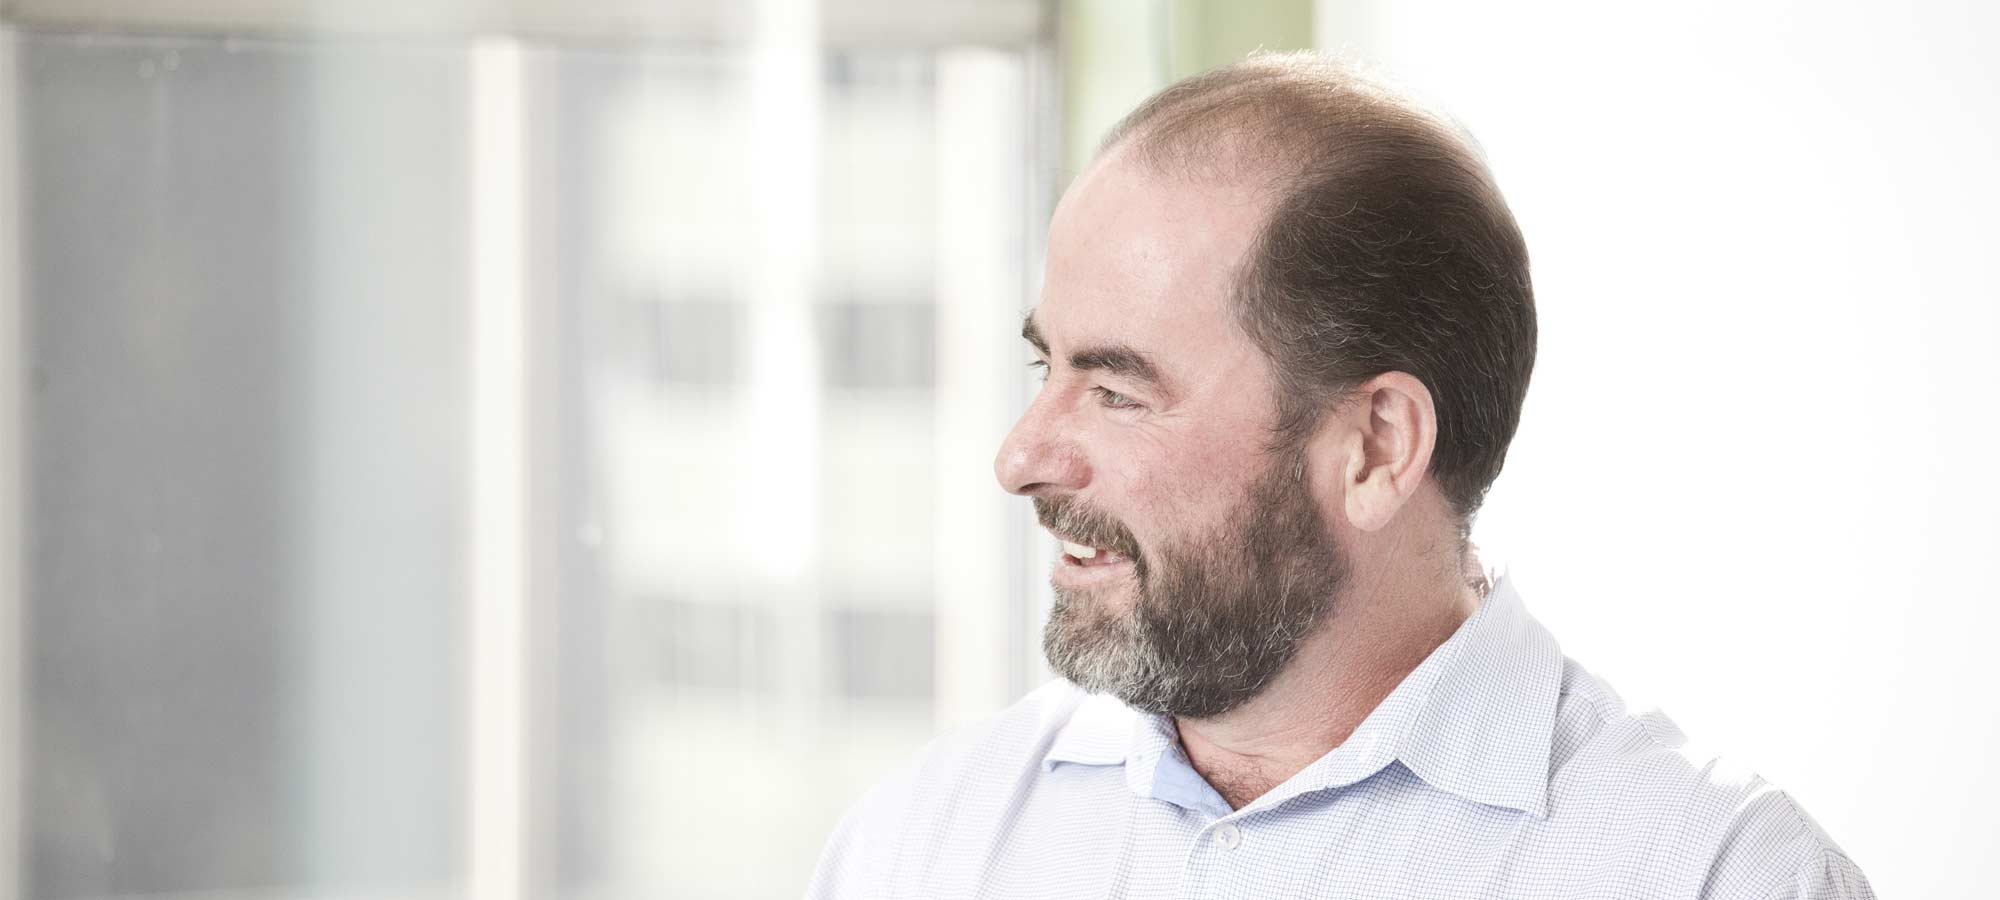 Paul Ramsay, Director and Principal Consultant - IT Governance, Equinox IT Wellington